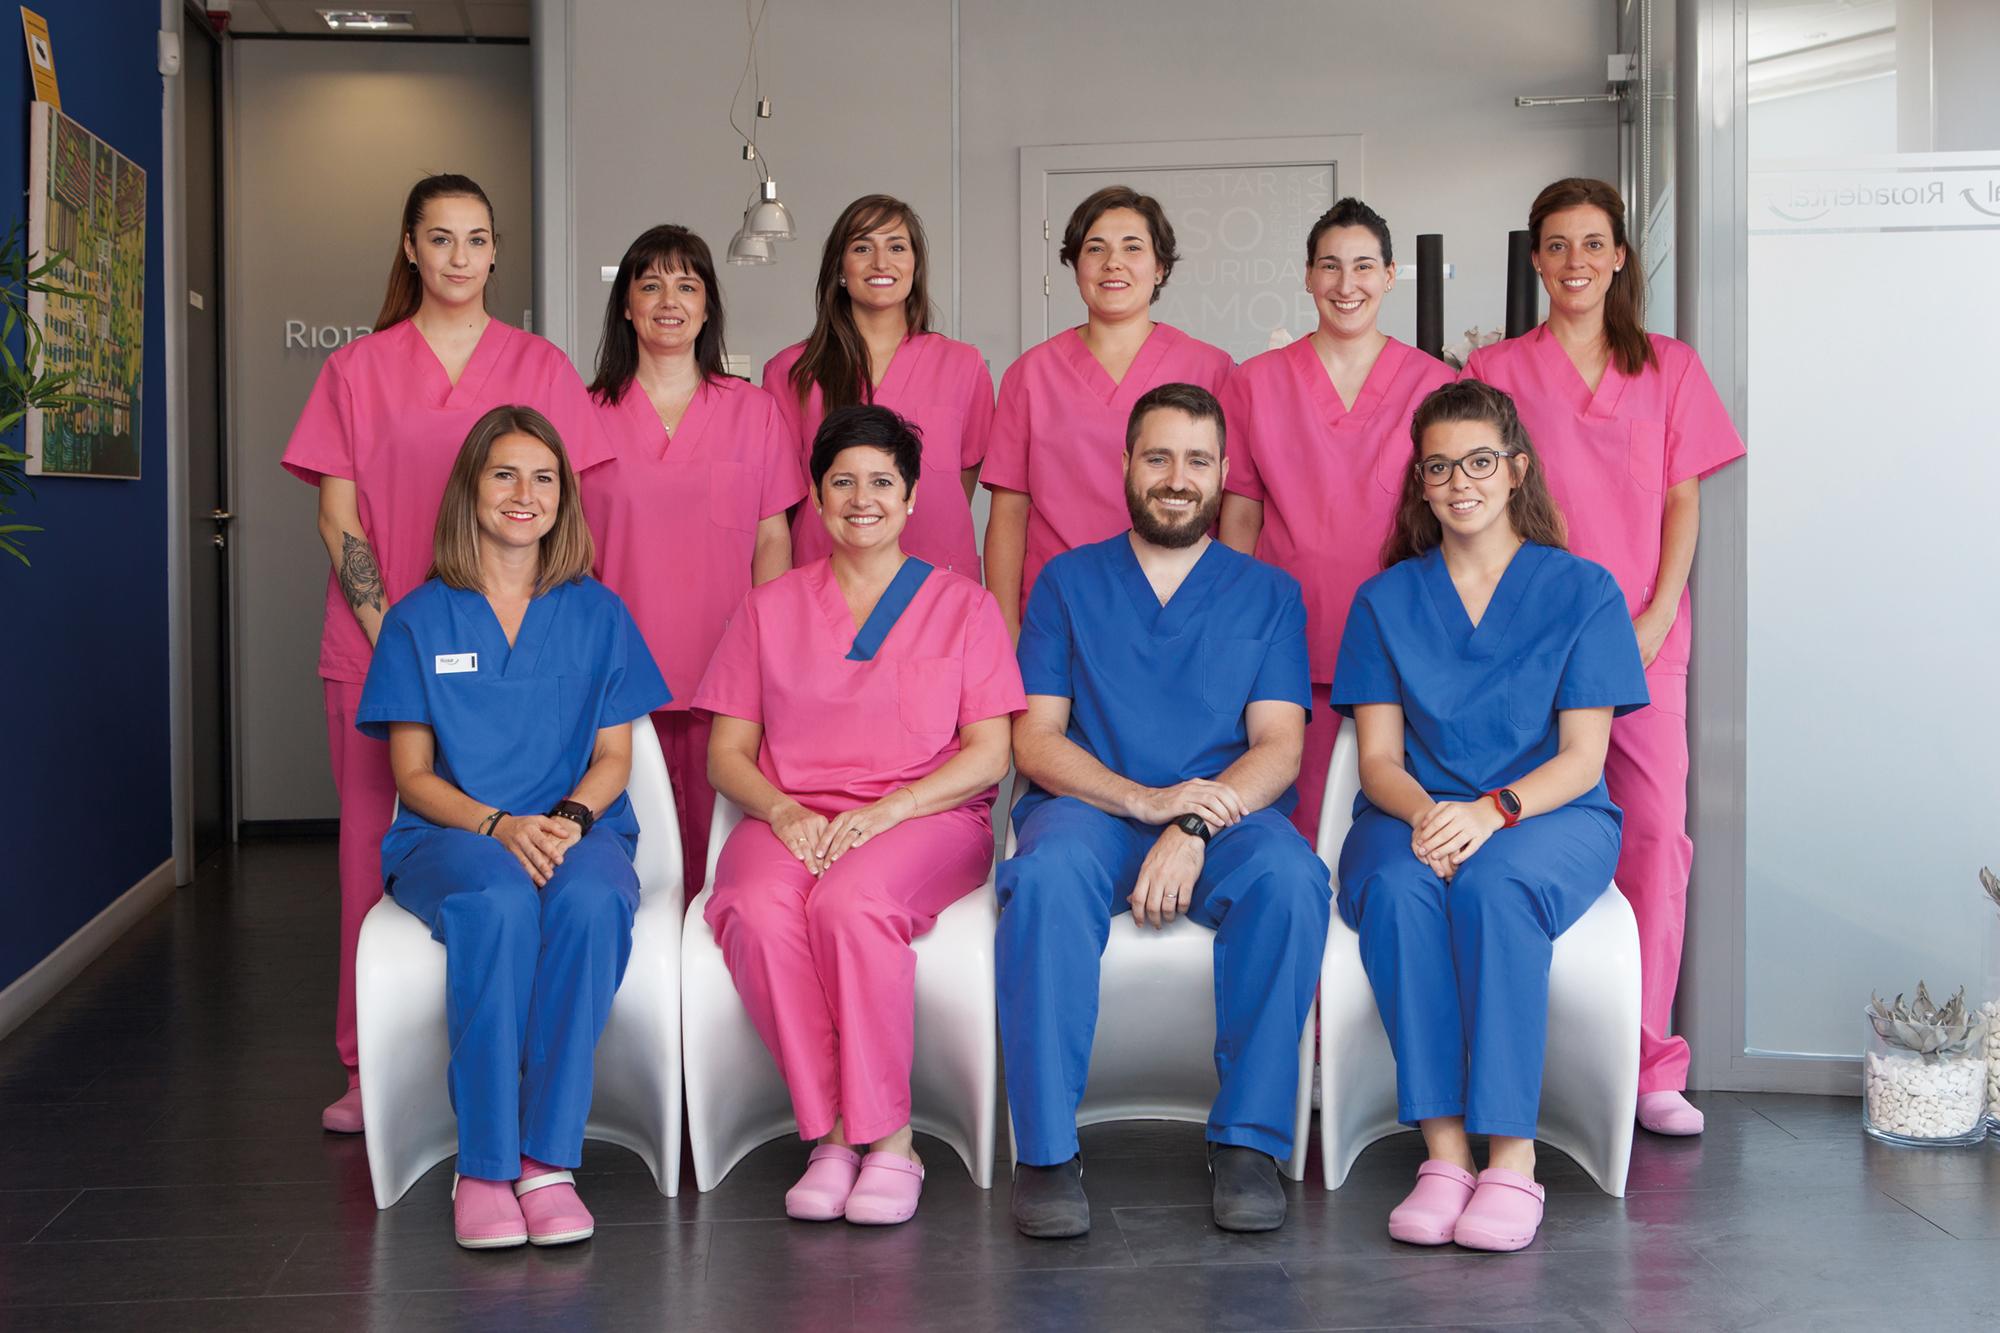 equipo clínica dental logroño